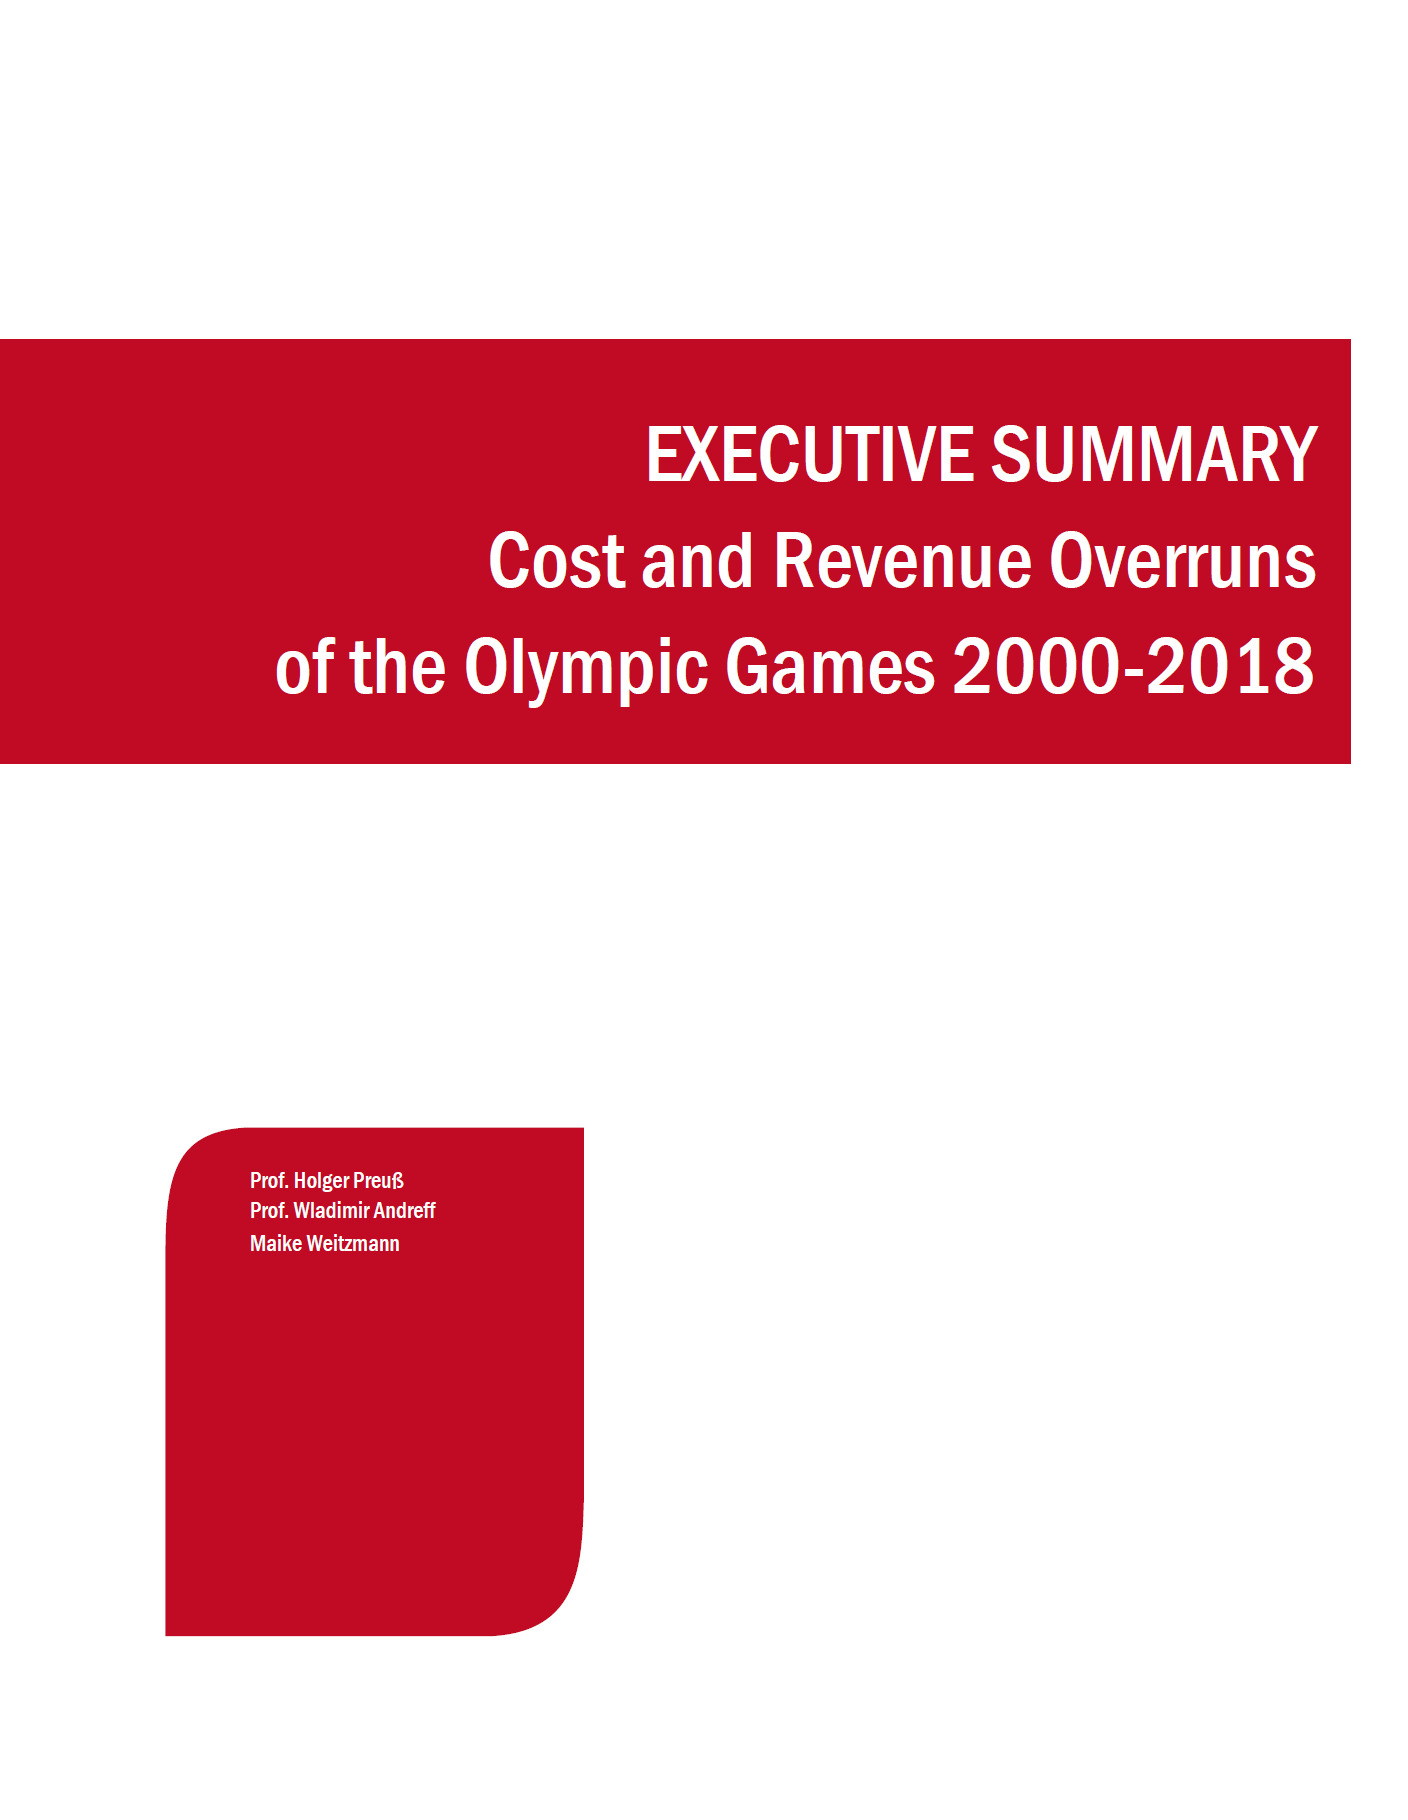 Cost and revenue overruns of the Olympic Games 2000-2018 : executive summary / Holger Preuss, Wladimir Andreff, Maike Weitzmann | Preuss, Holger